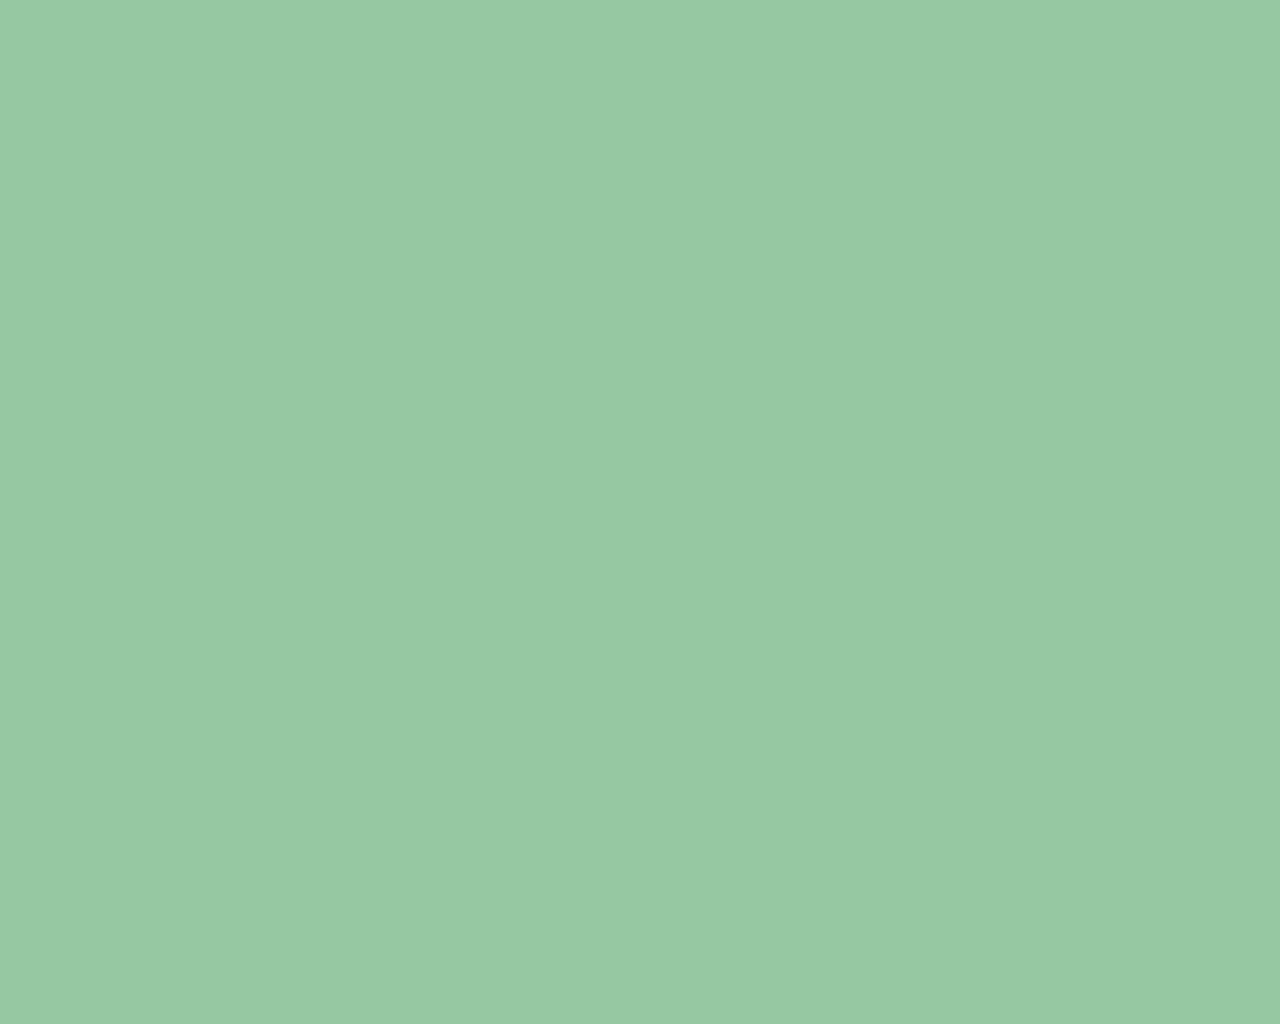 1280x1024 Eton Blue Solid Color Background